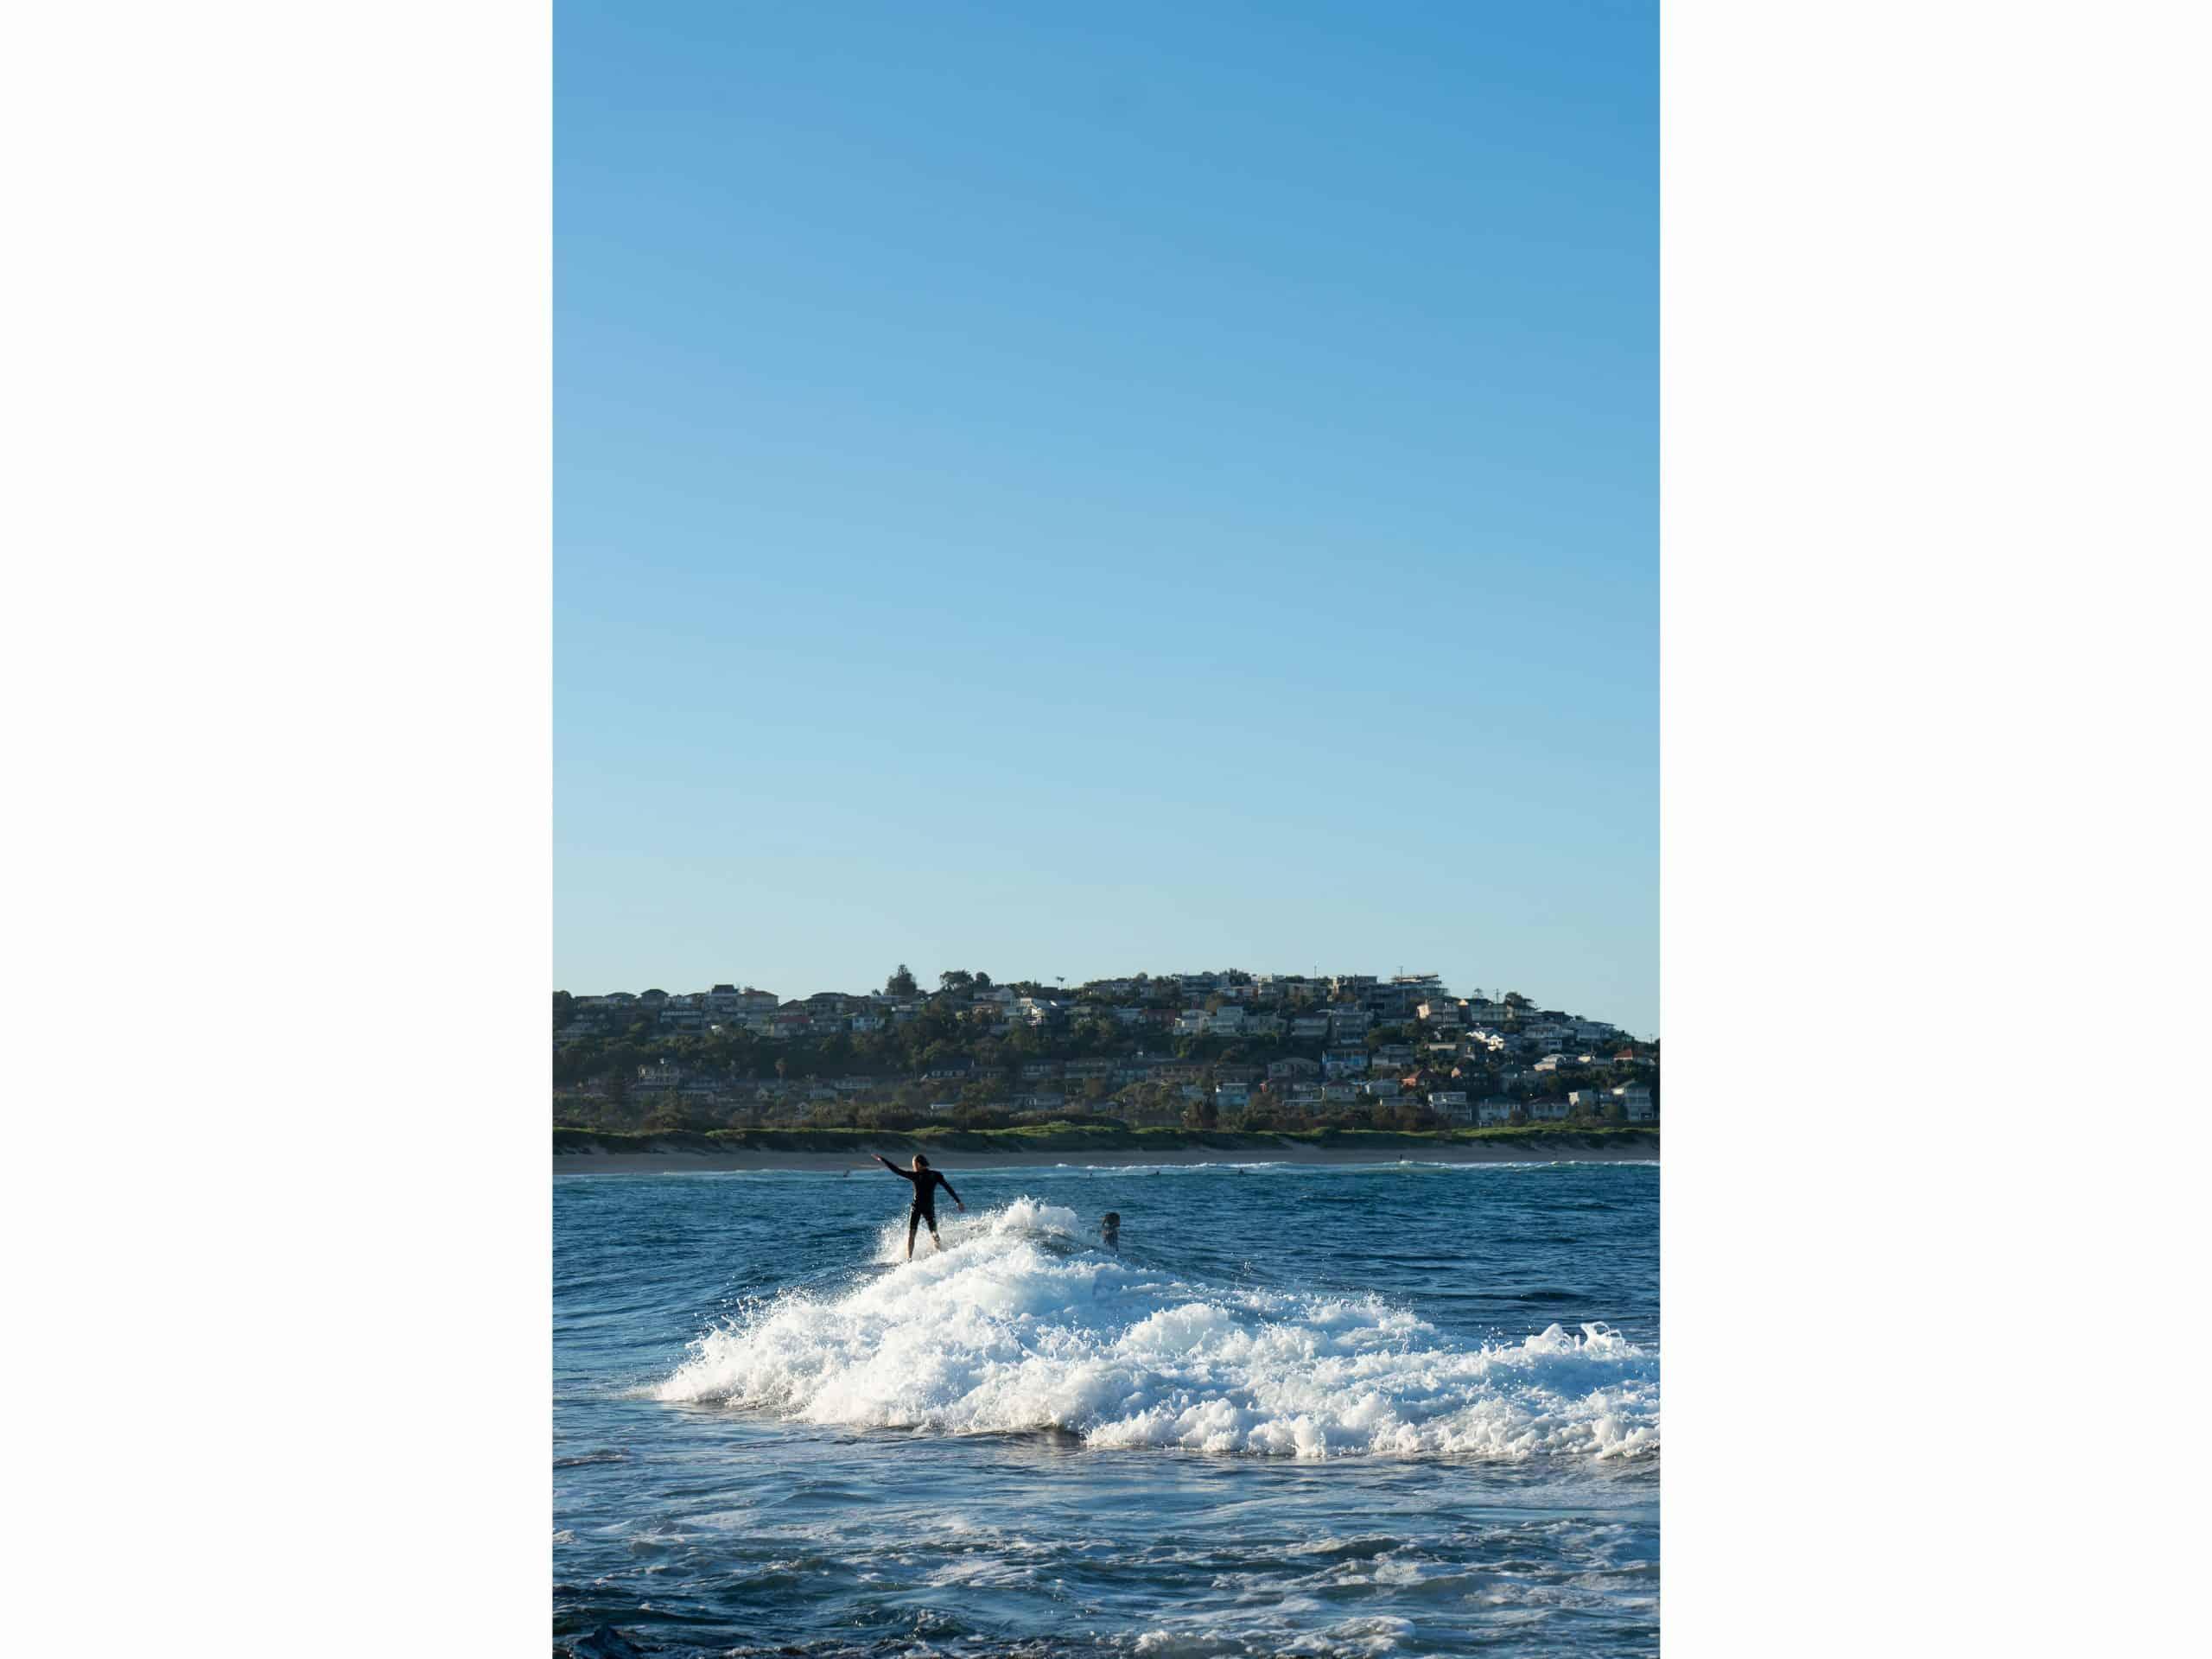 Ocean Surf Wall Art Prints Australia